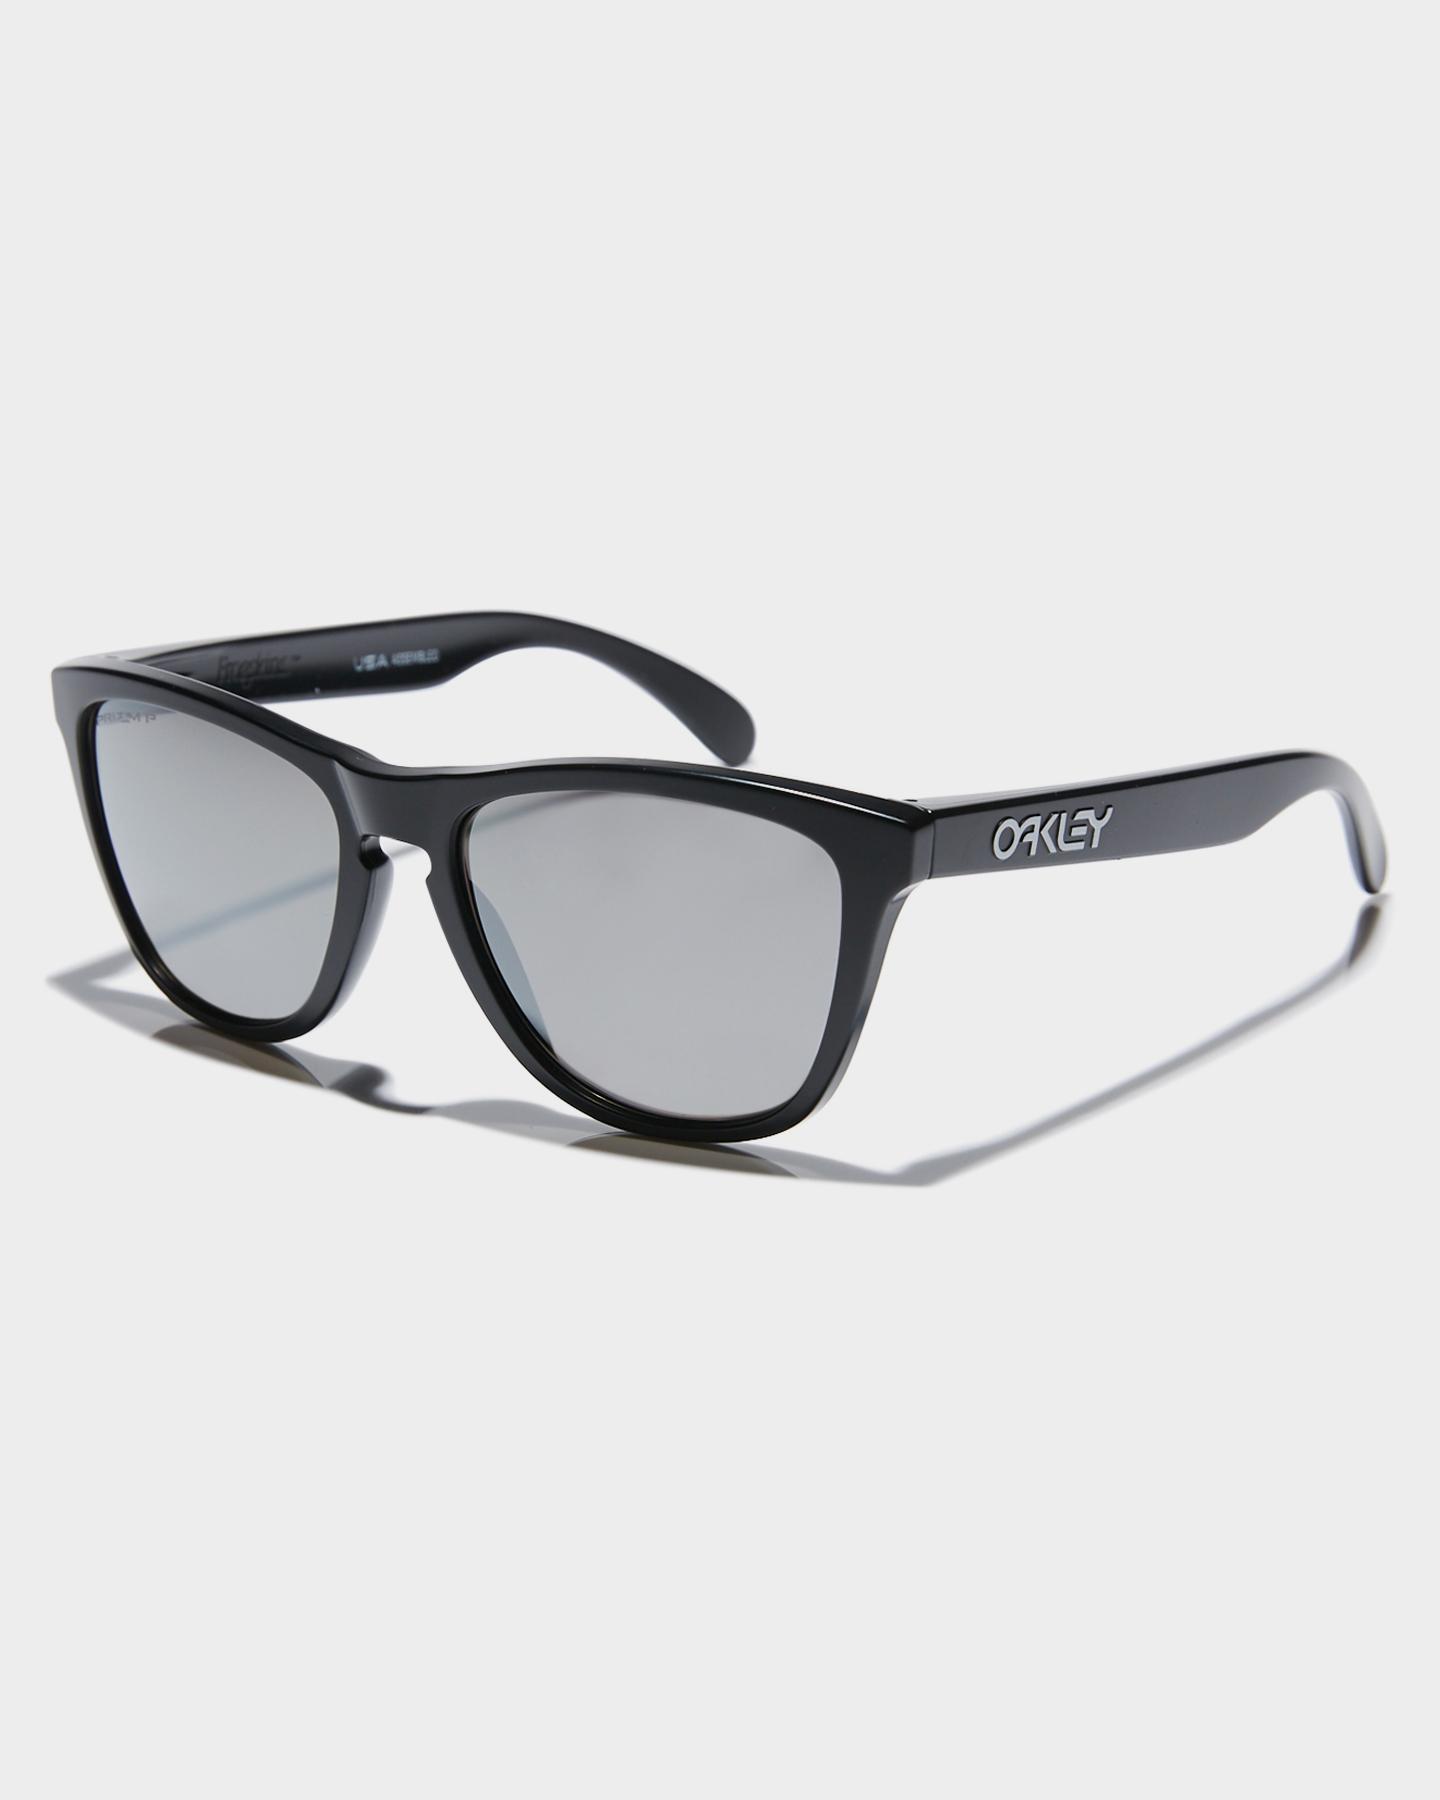 Oakley Frogskins Polarized Sunglasses Matte Black Prizm